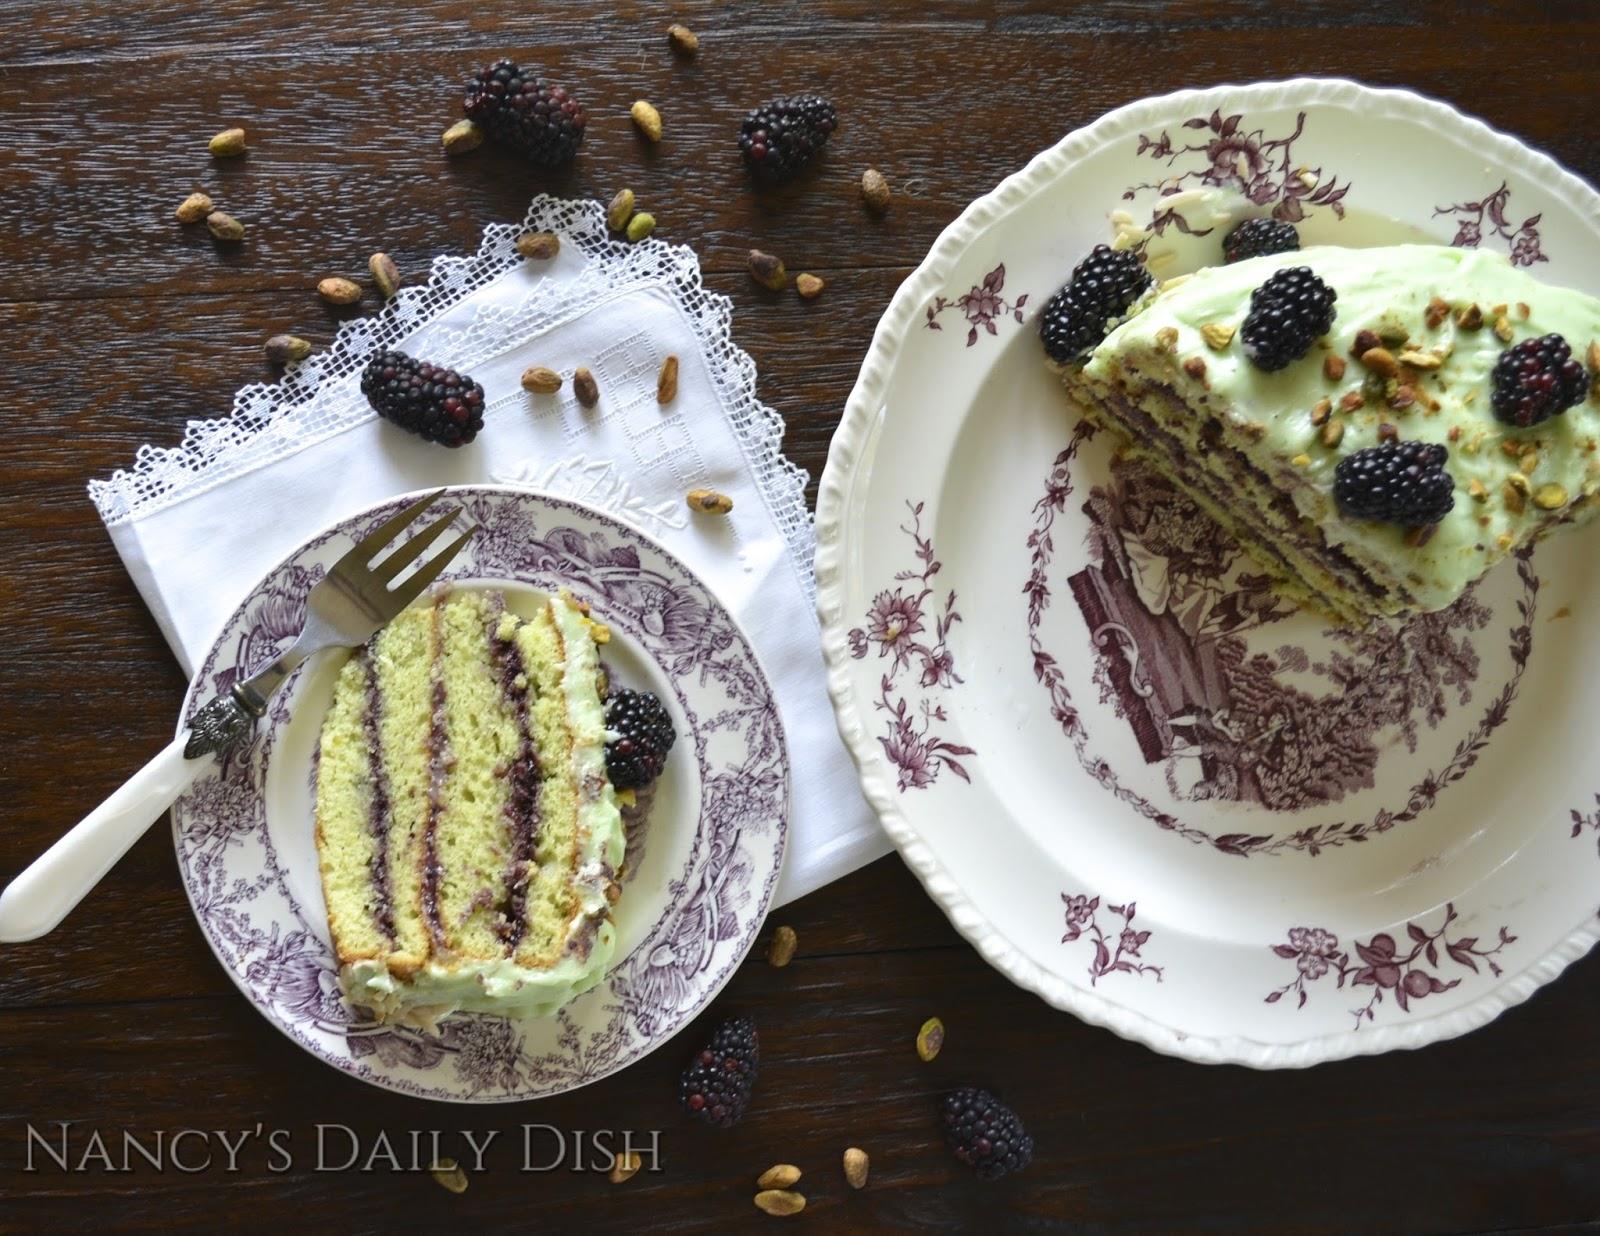 ... Almond Cake w/ Blackberry Filling & Pistachio Cream Cheese Frosting